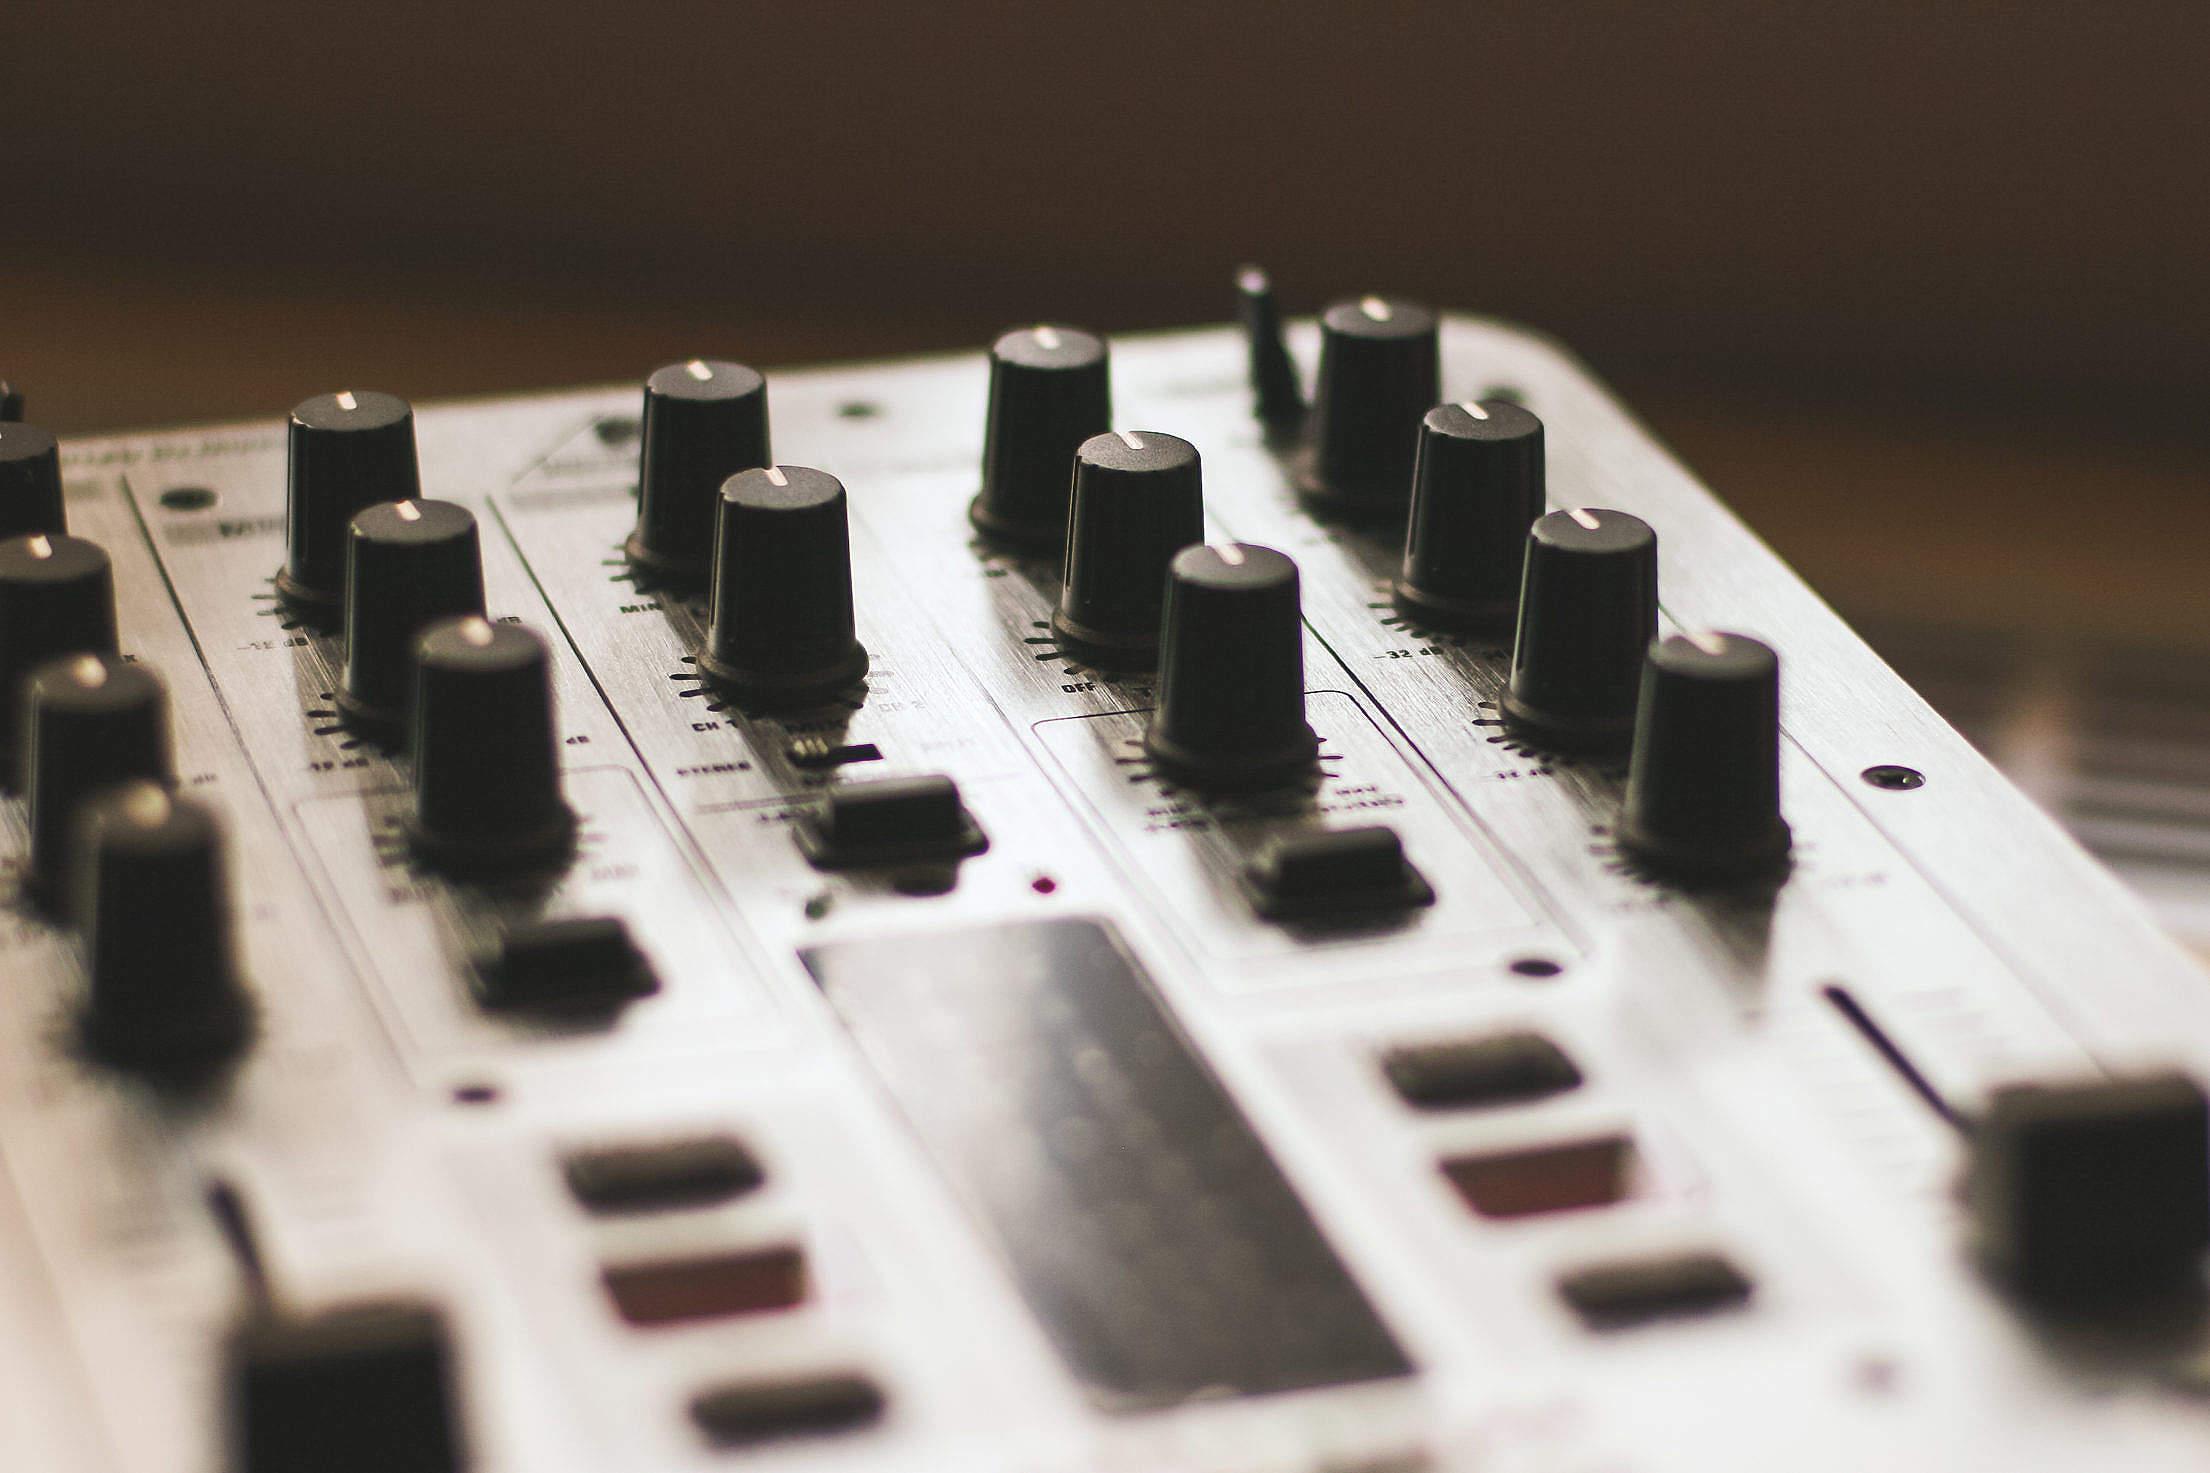 DJ Mix Knobs Close Up Free Stock Photo